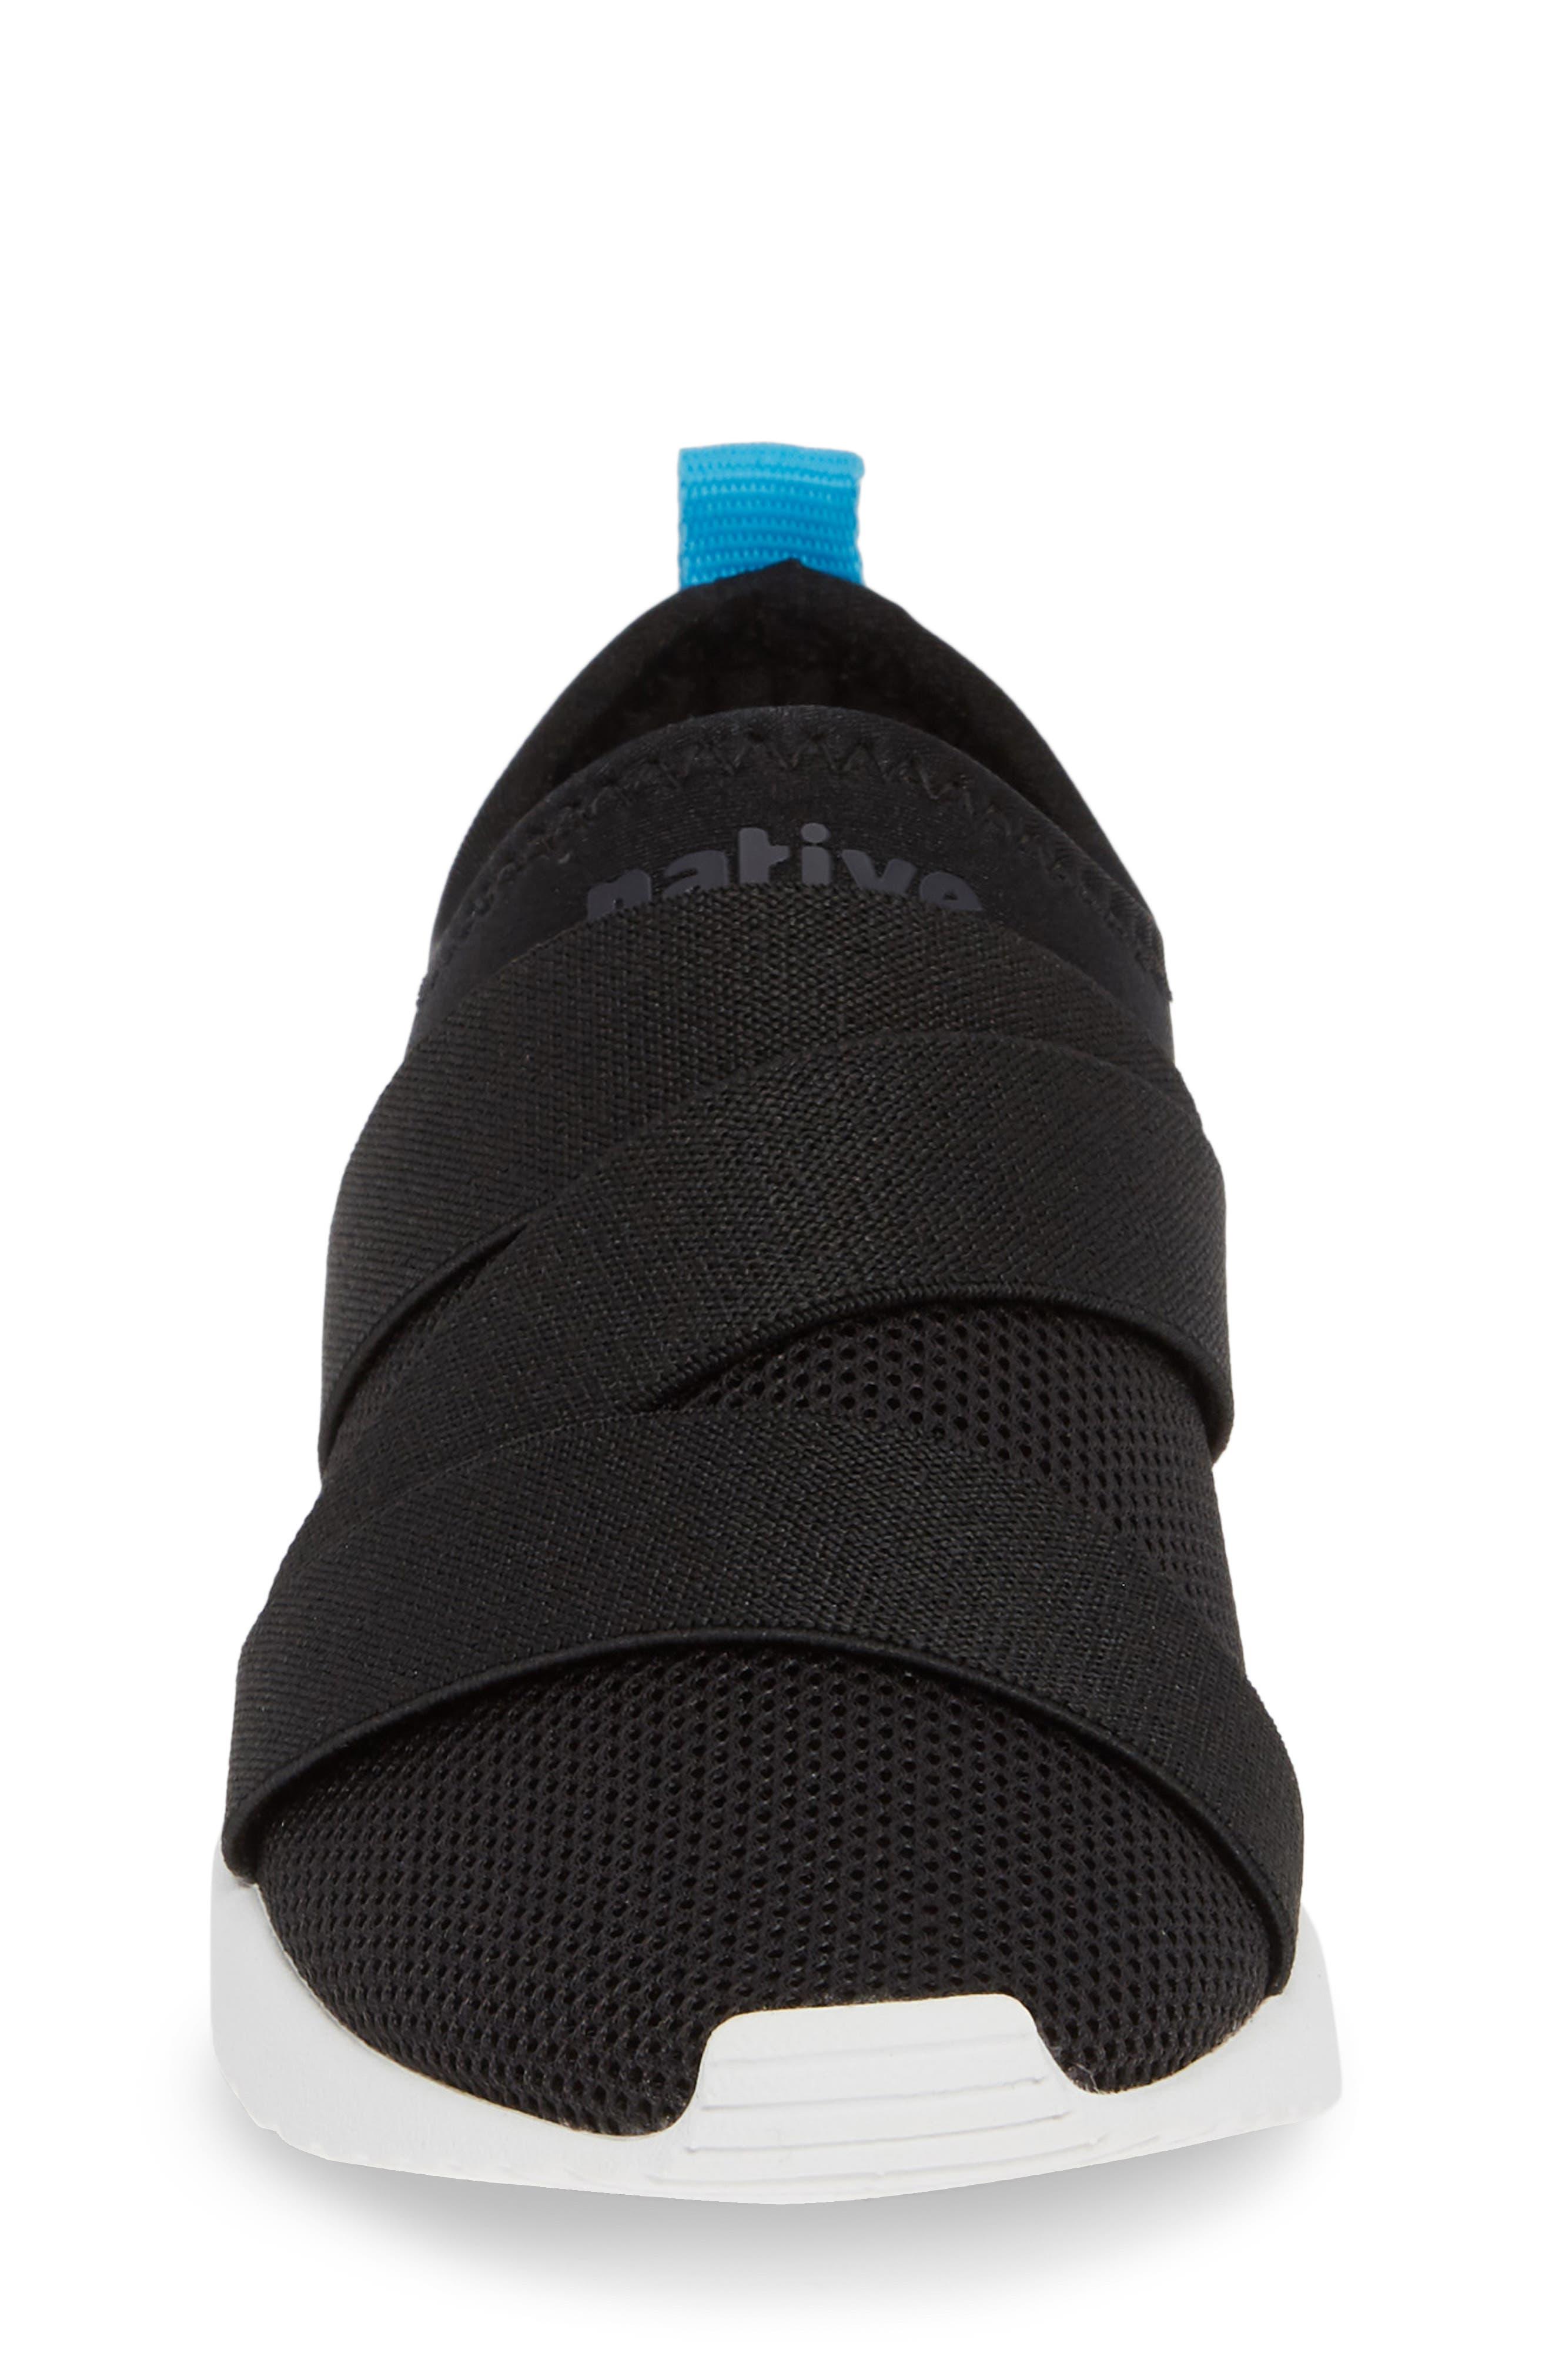 Phoenix Slip-On Sneaker,                             Alternate thumbnail 4, color,                             JIFFY BLACK/ SHELL WHITE